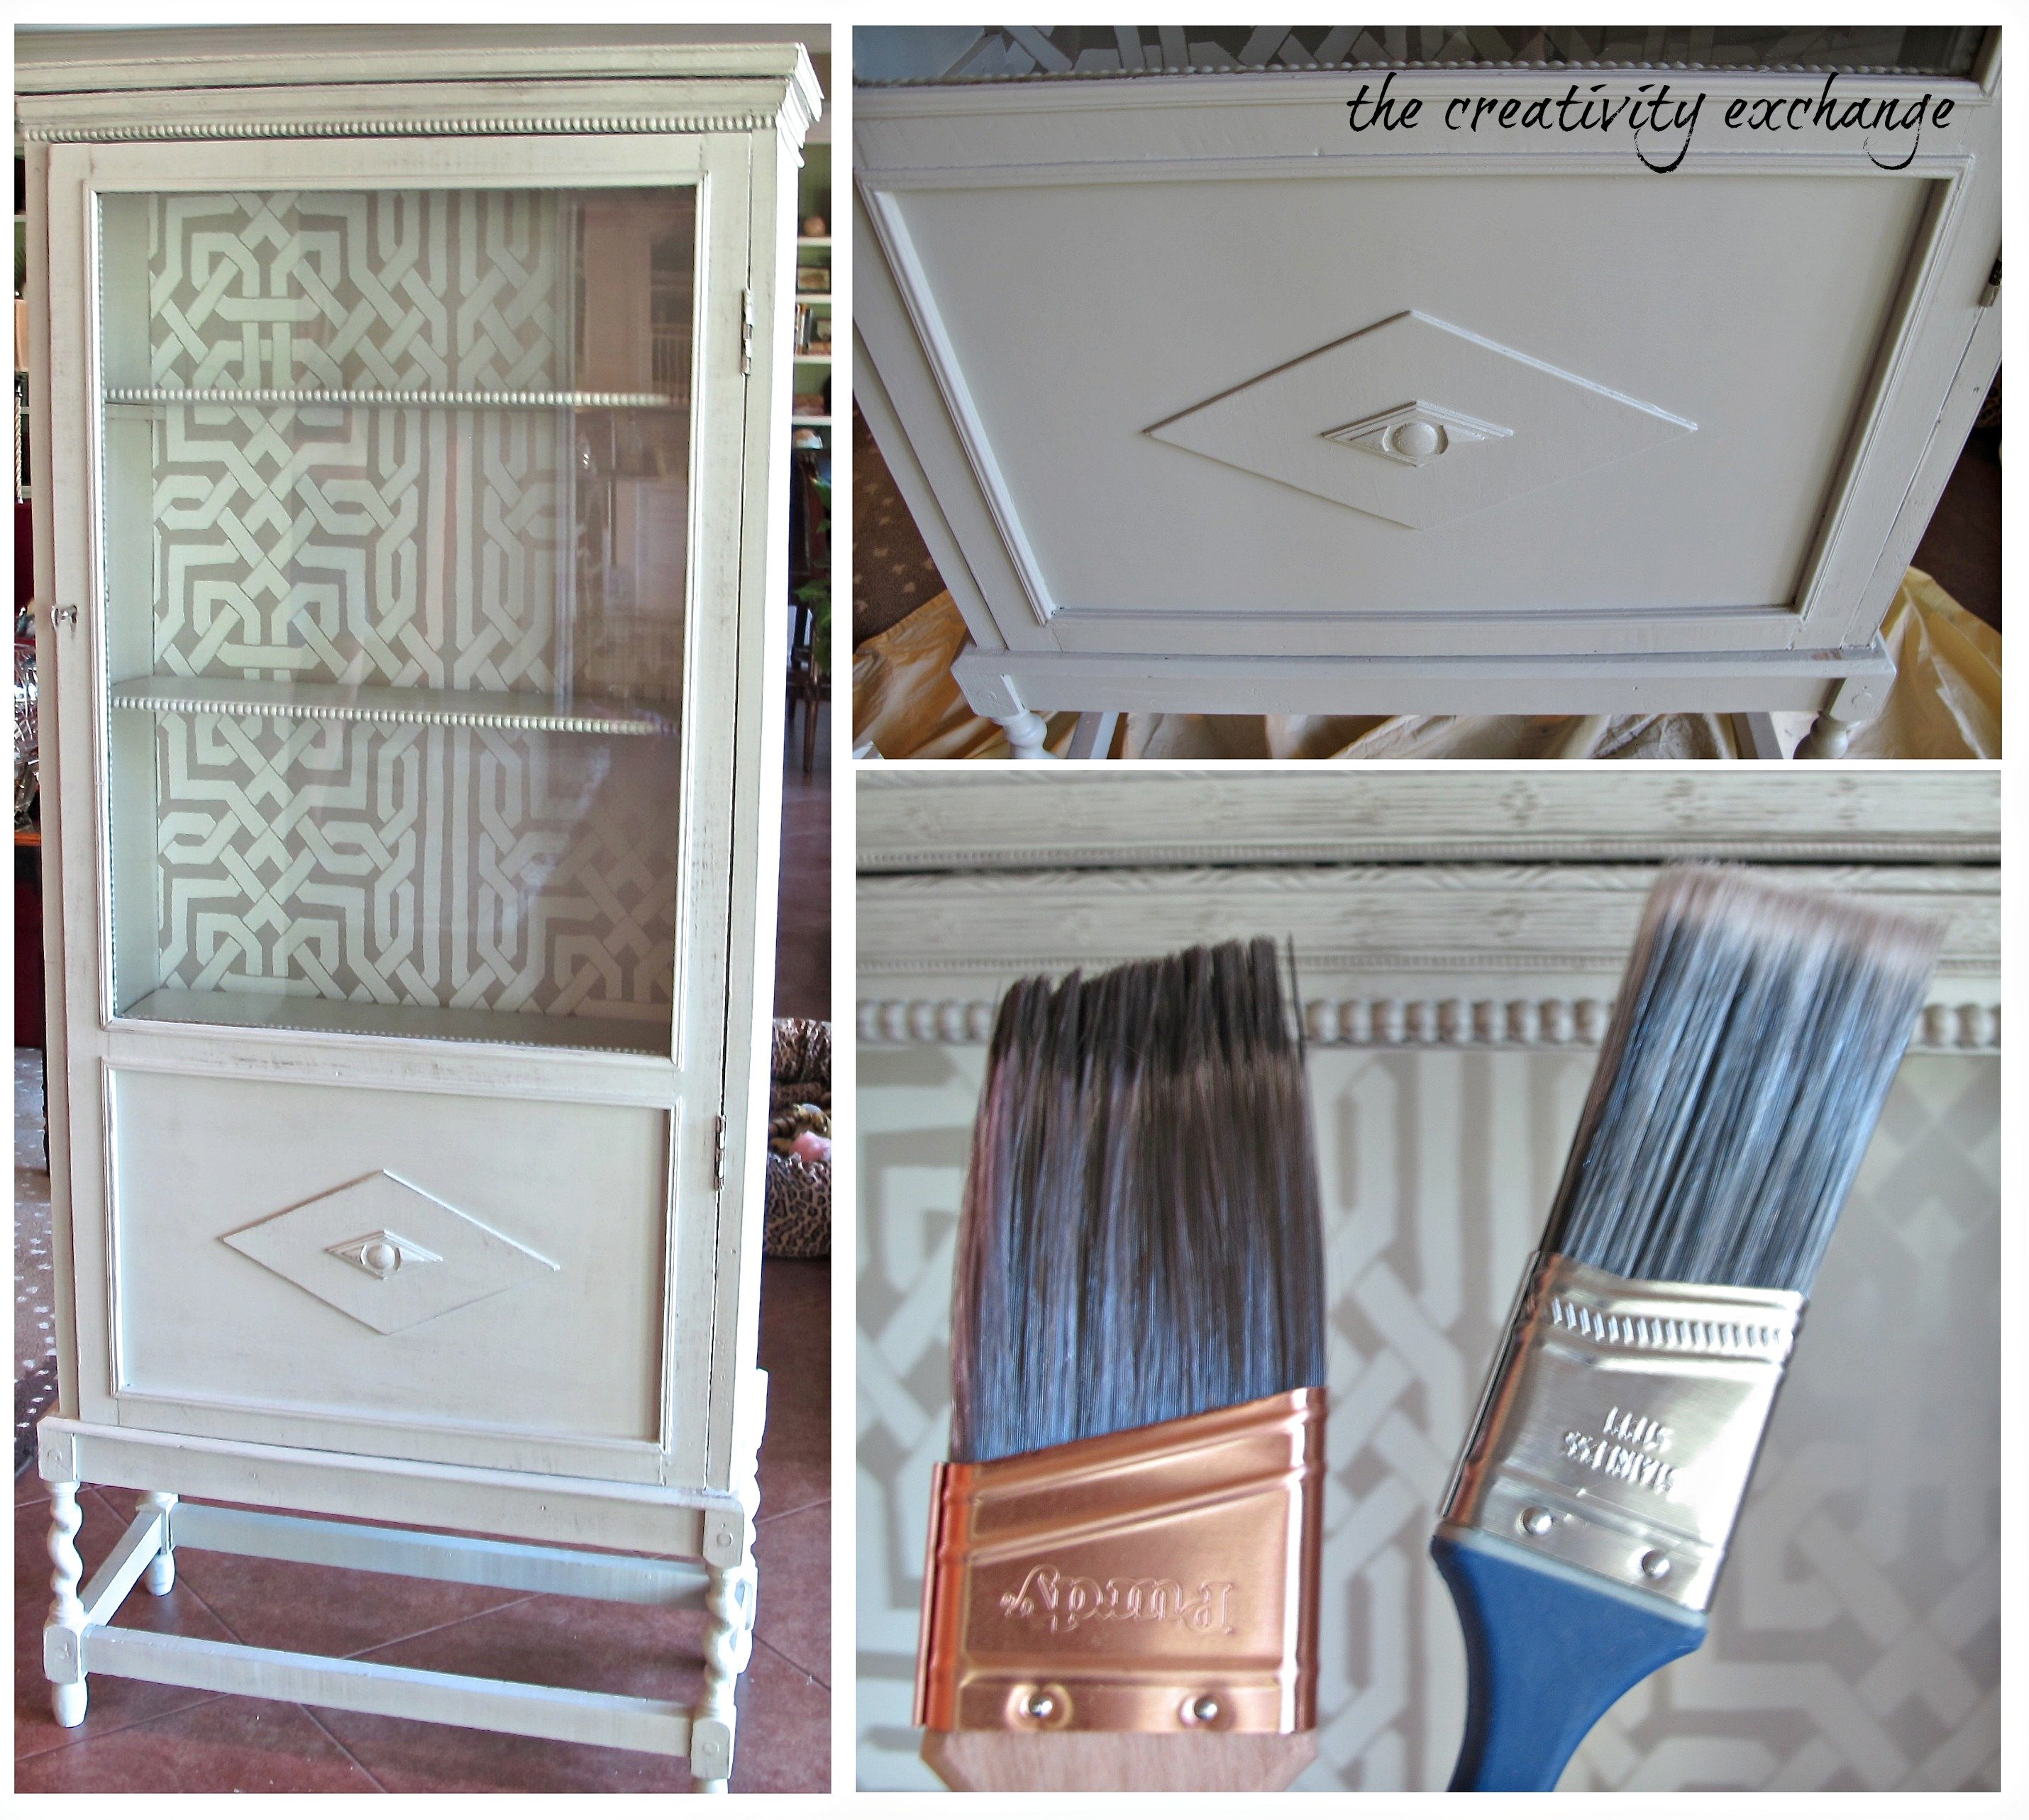 Flawless Matte Satin Paint Finish: Furniture Painting Basics